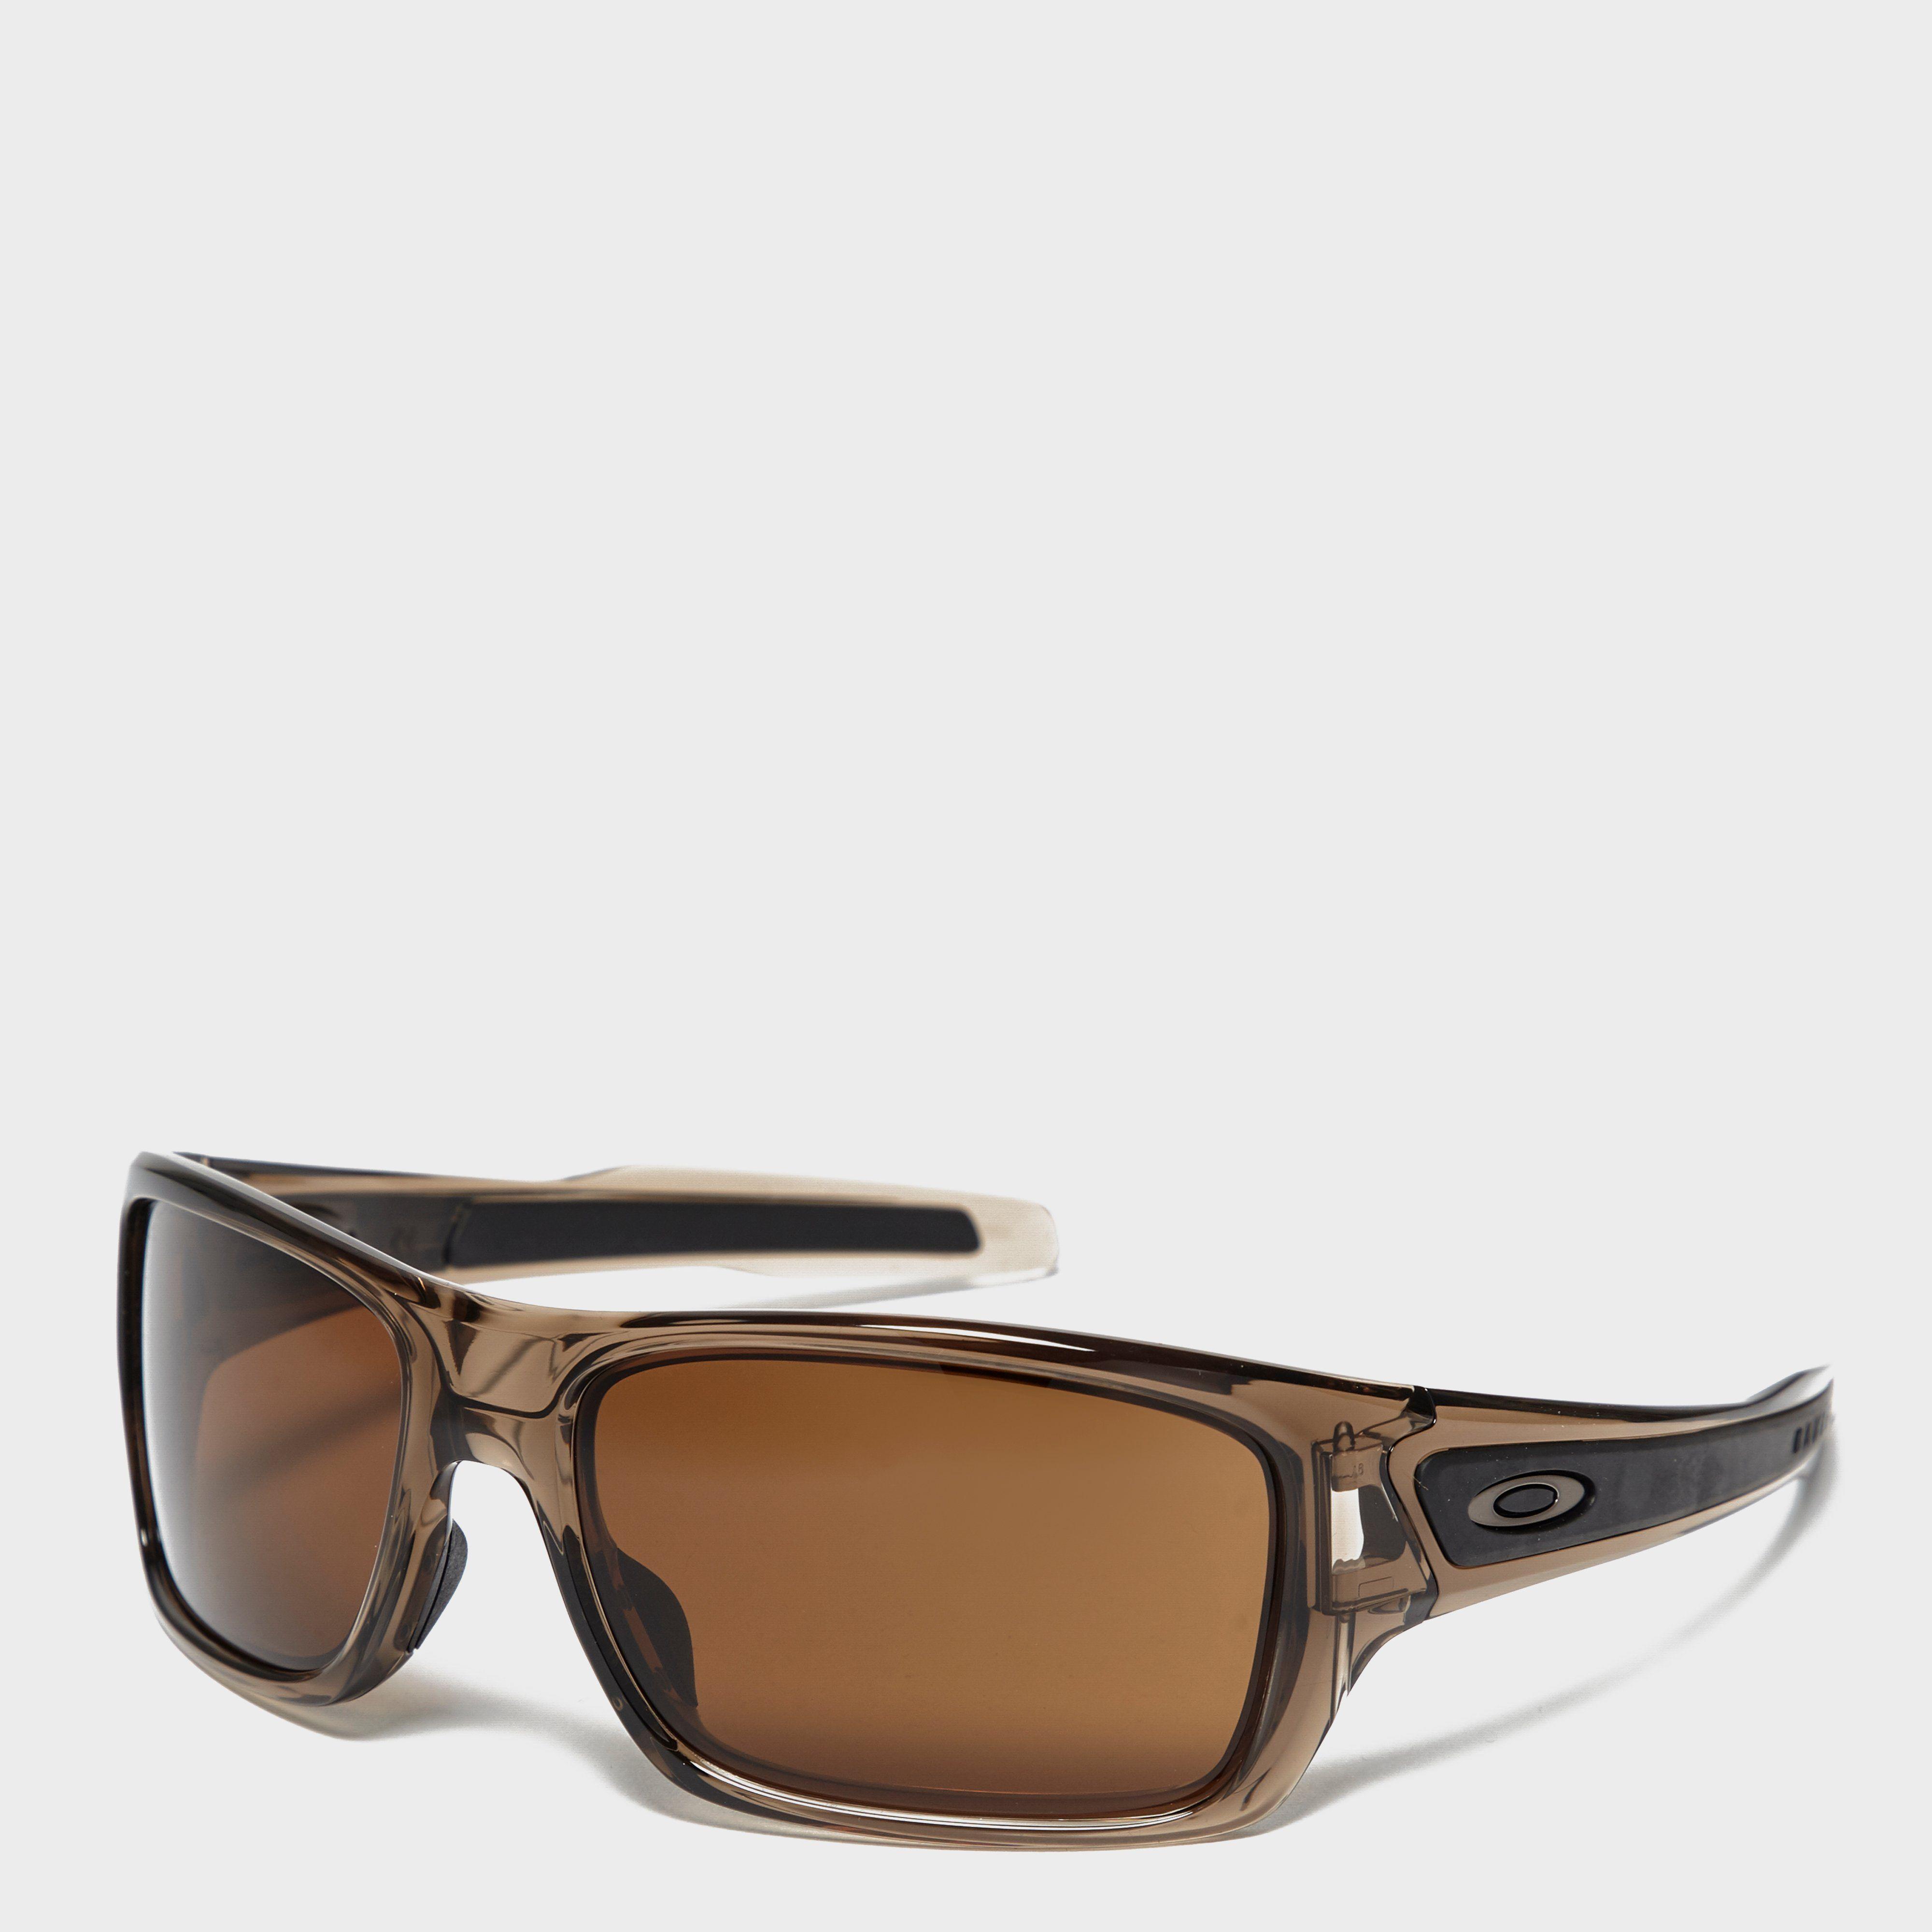 OAKLEY Turbine™ Dark Bronze Sunglasses